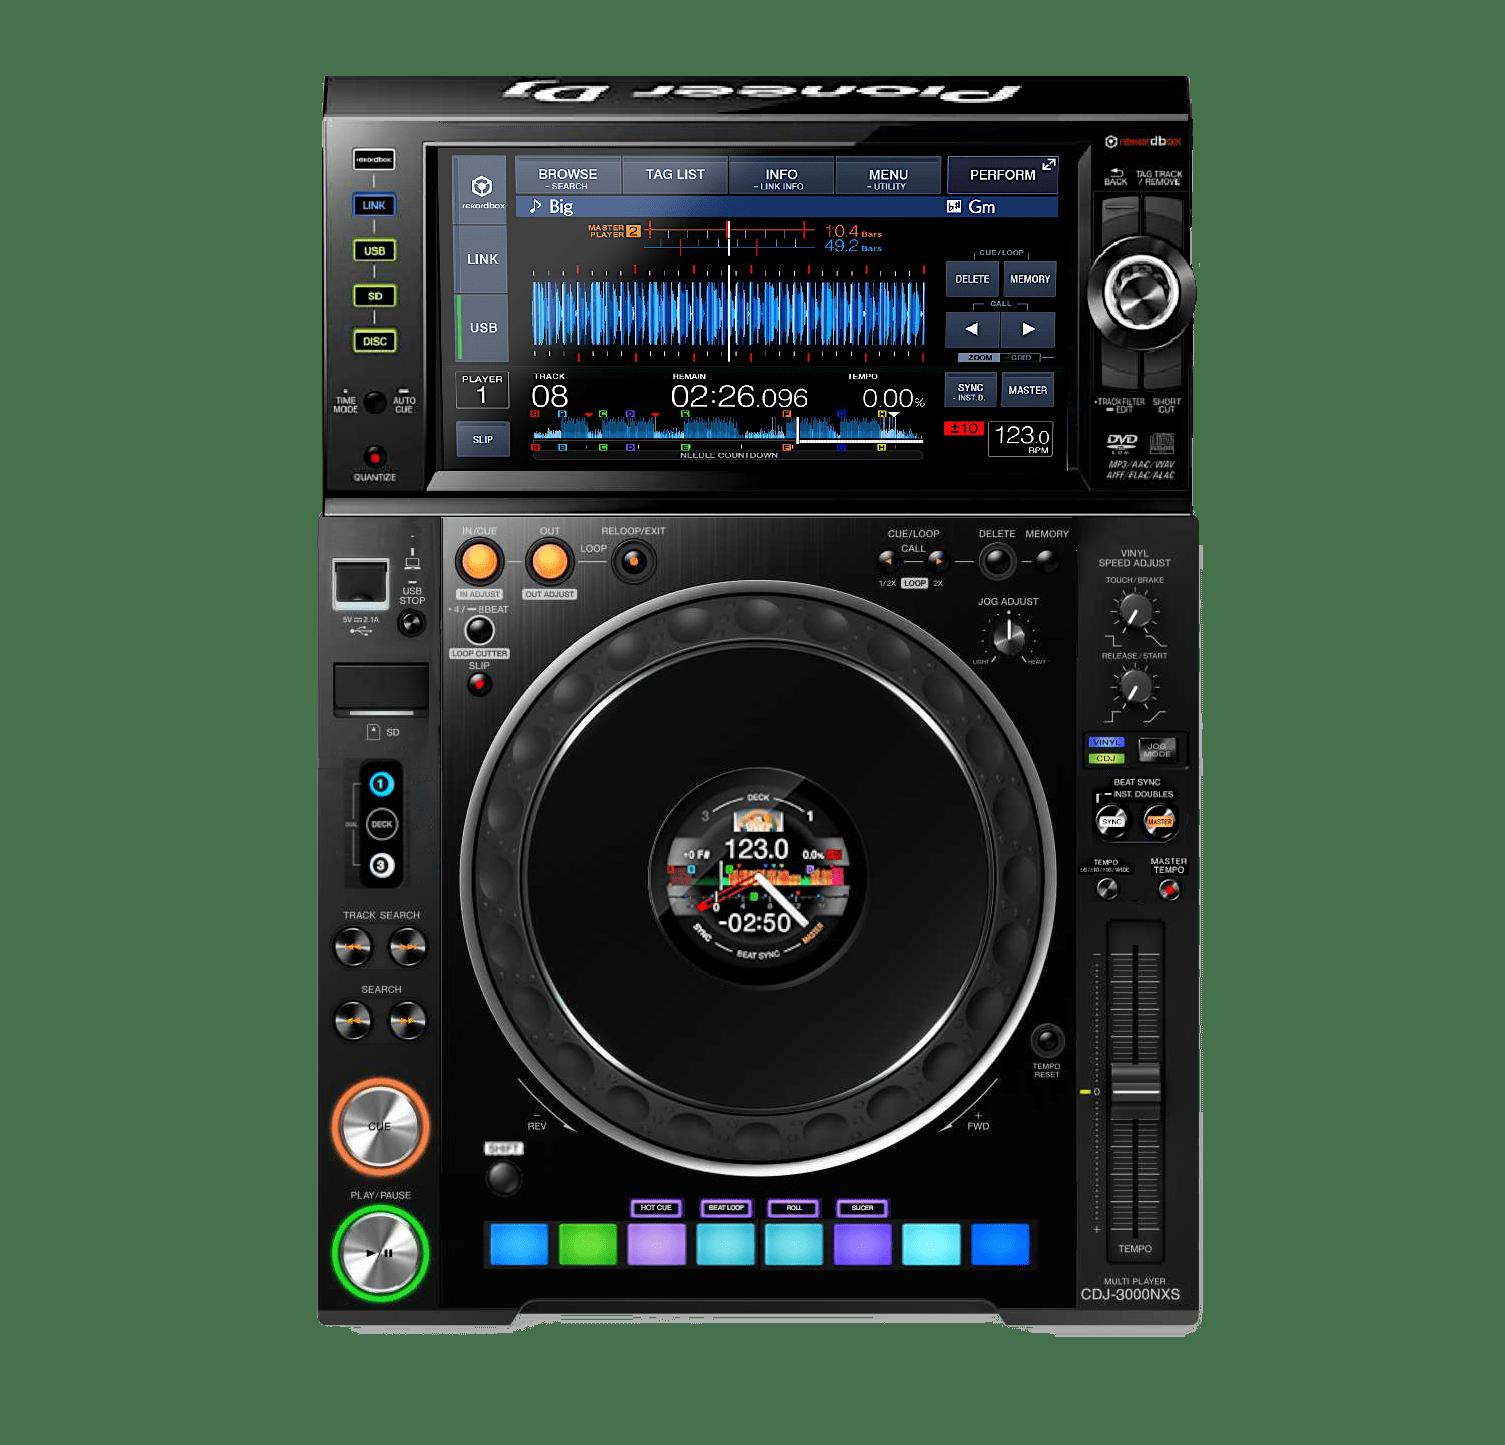 Future DJ Gear Concepts: Pioneer DJ CDJ-3000 - DJ TechTools